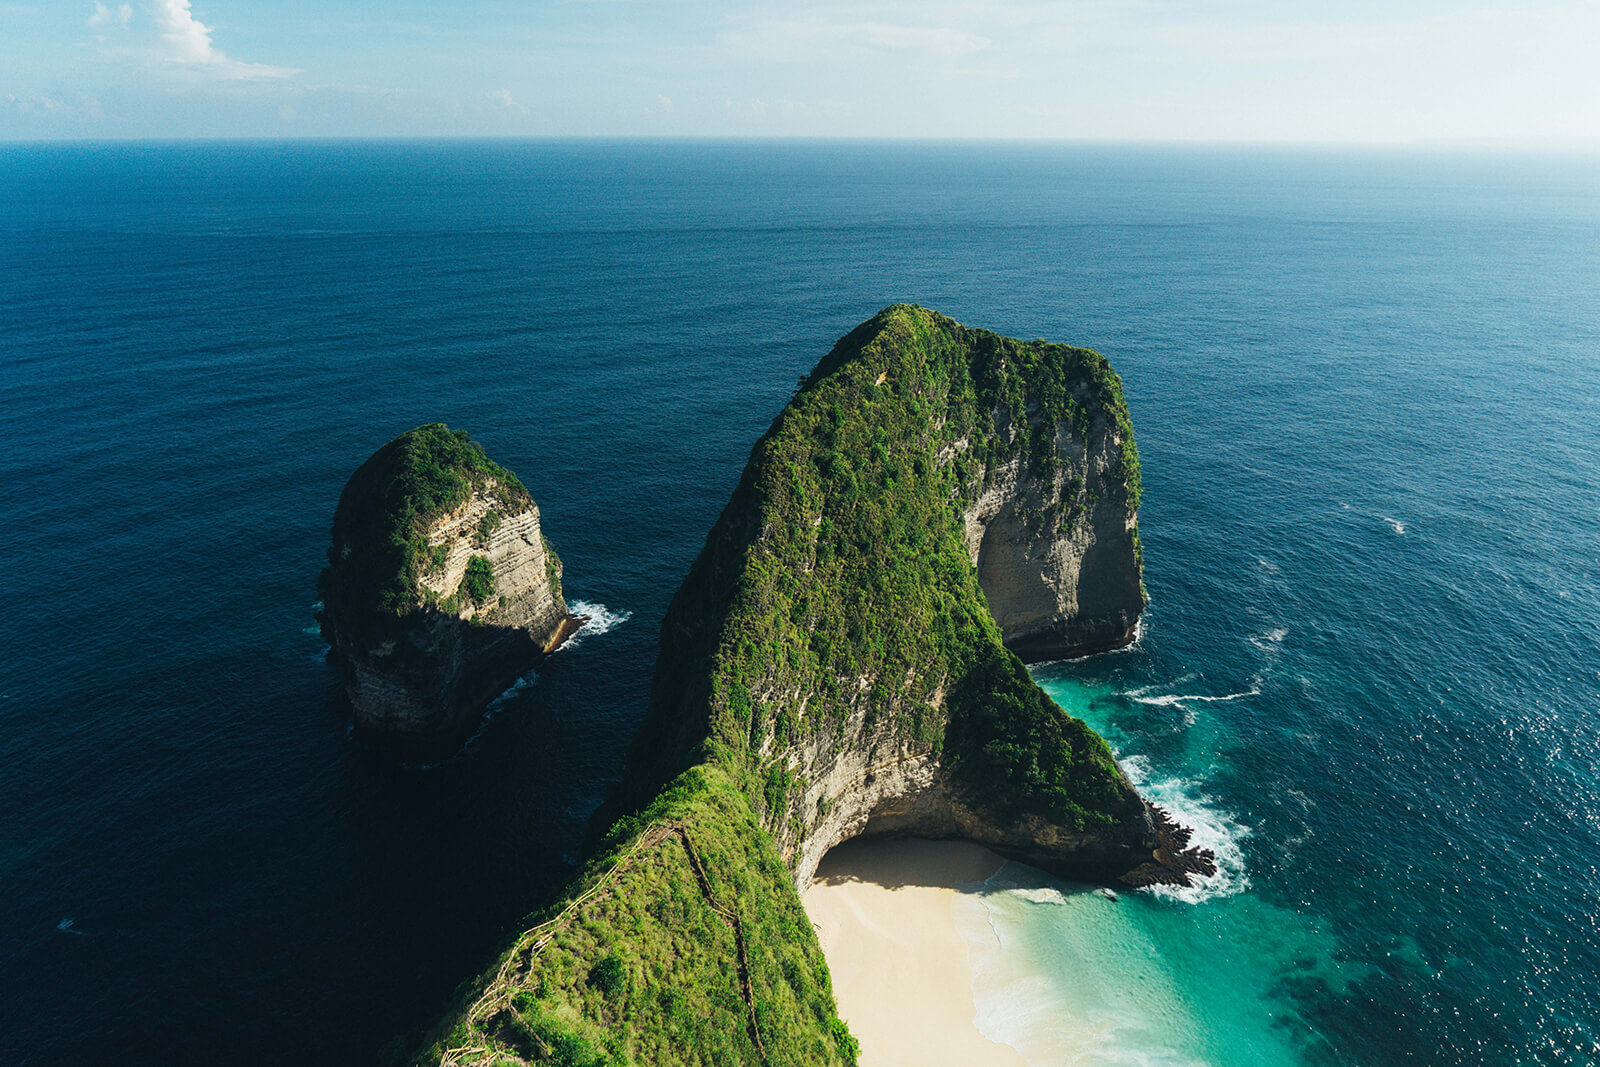 Drone view of the deserted Kelingking Beach on Nusa Penida in Indonesia